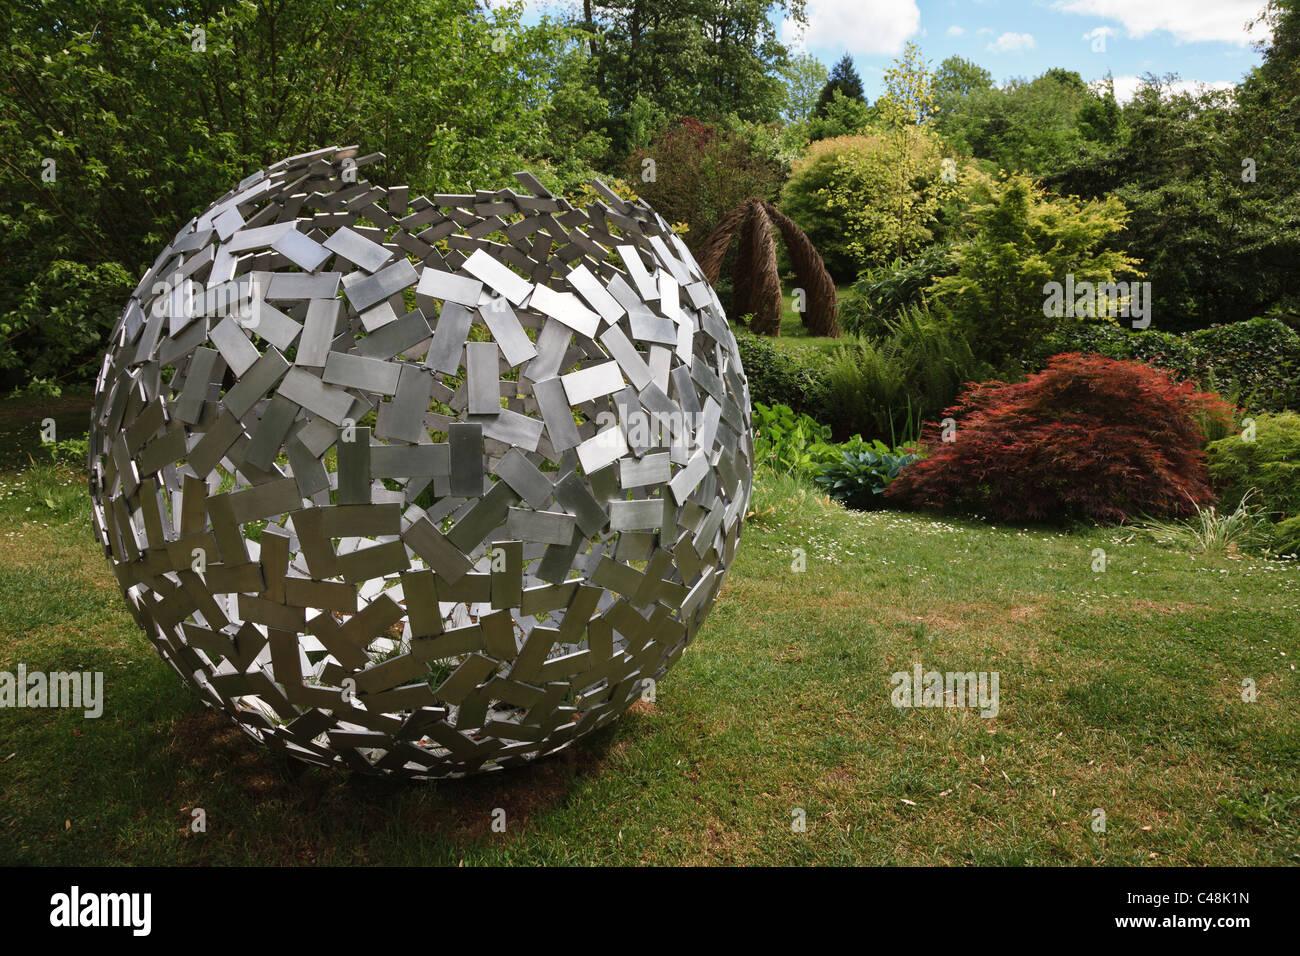 sculpture contemporaine jardin Le jardin de sculptures contemporaines, Burghley House, près de Stamford,  dans le Cambridgeshire.